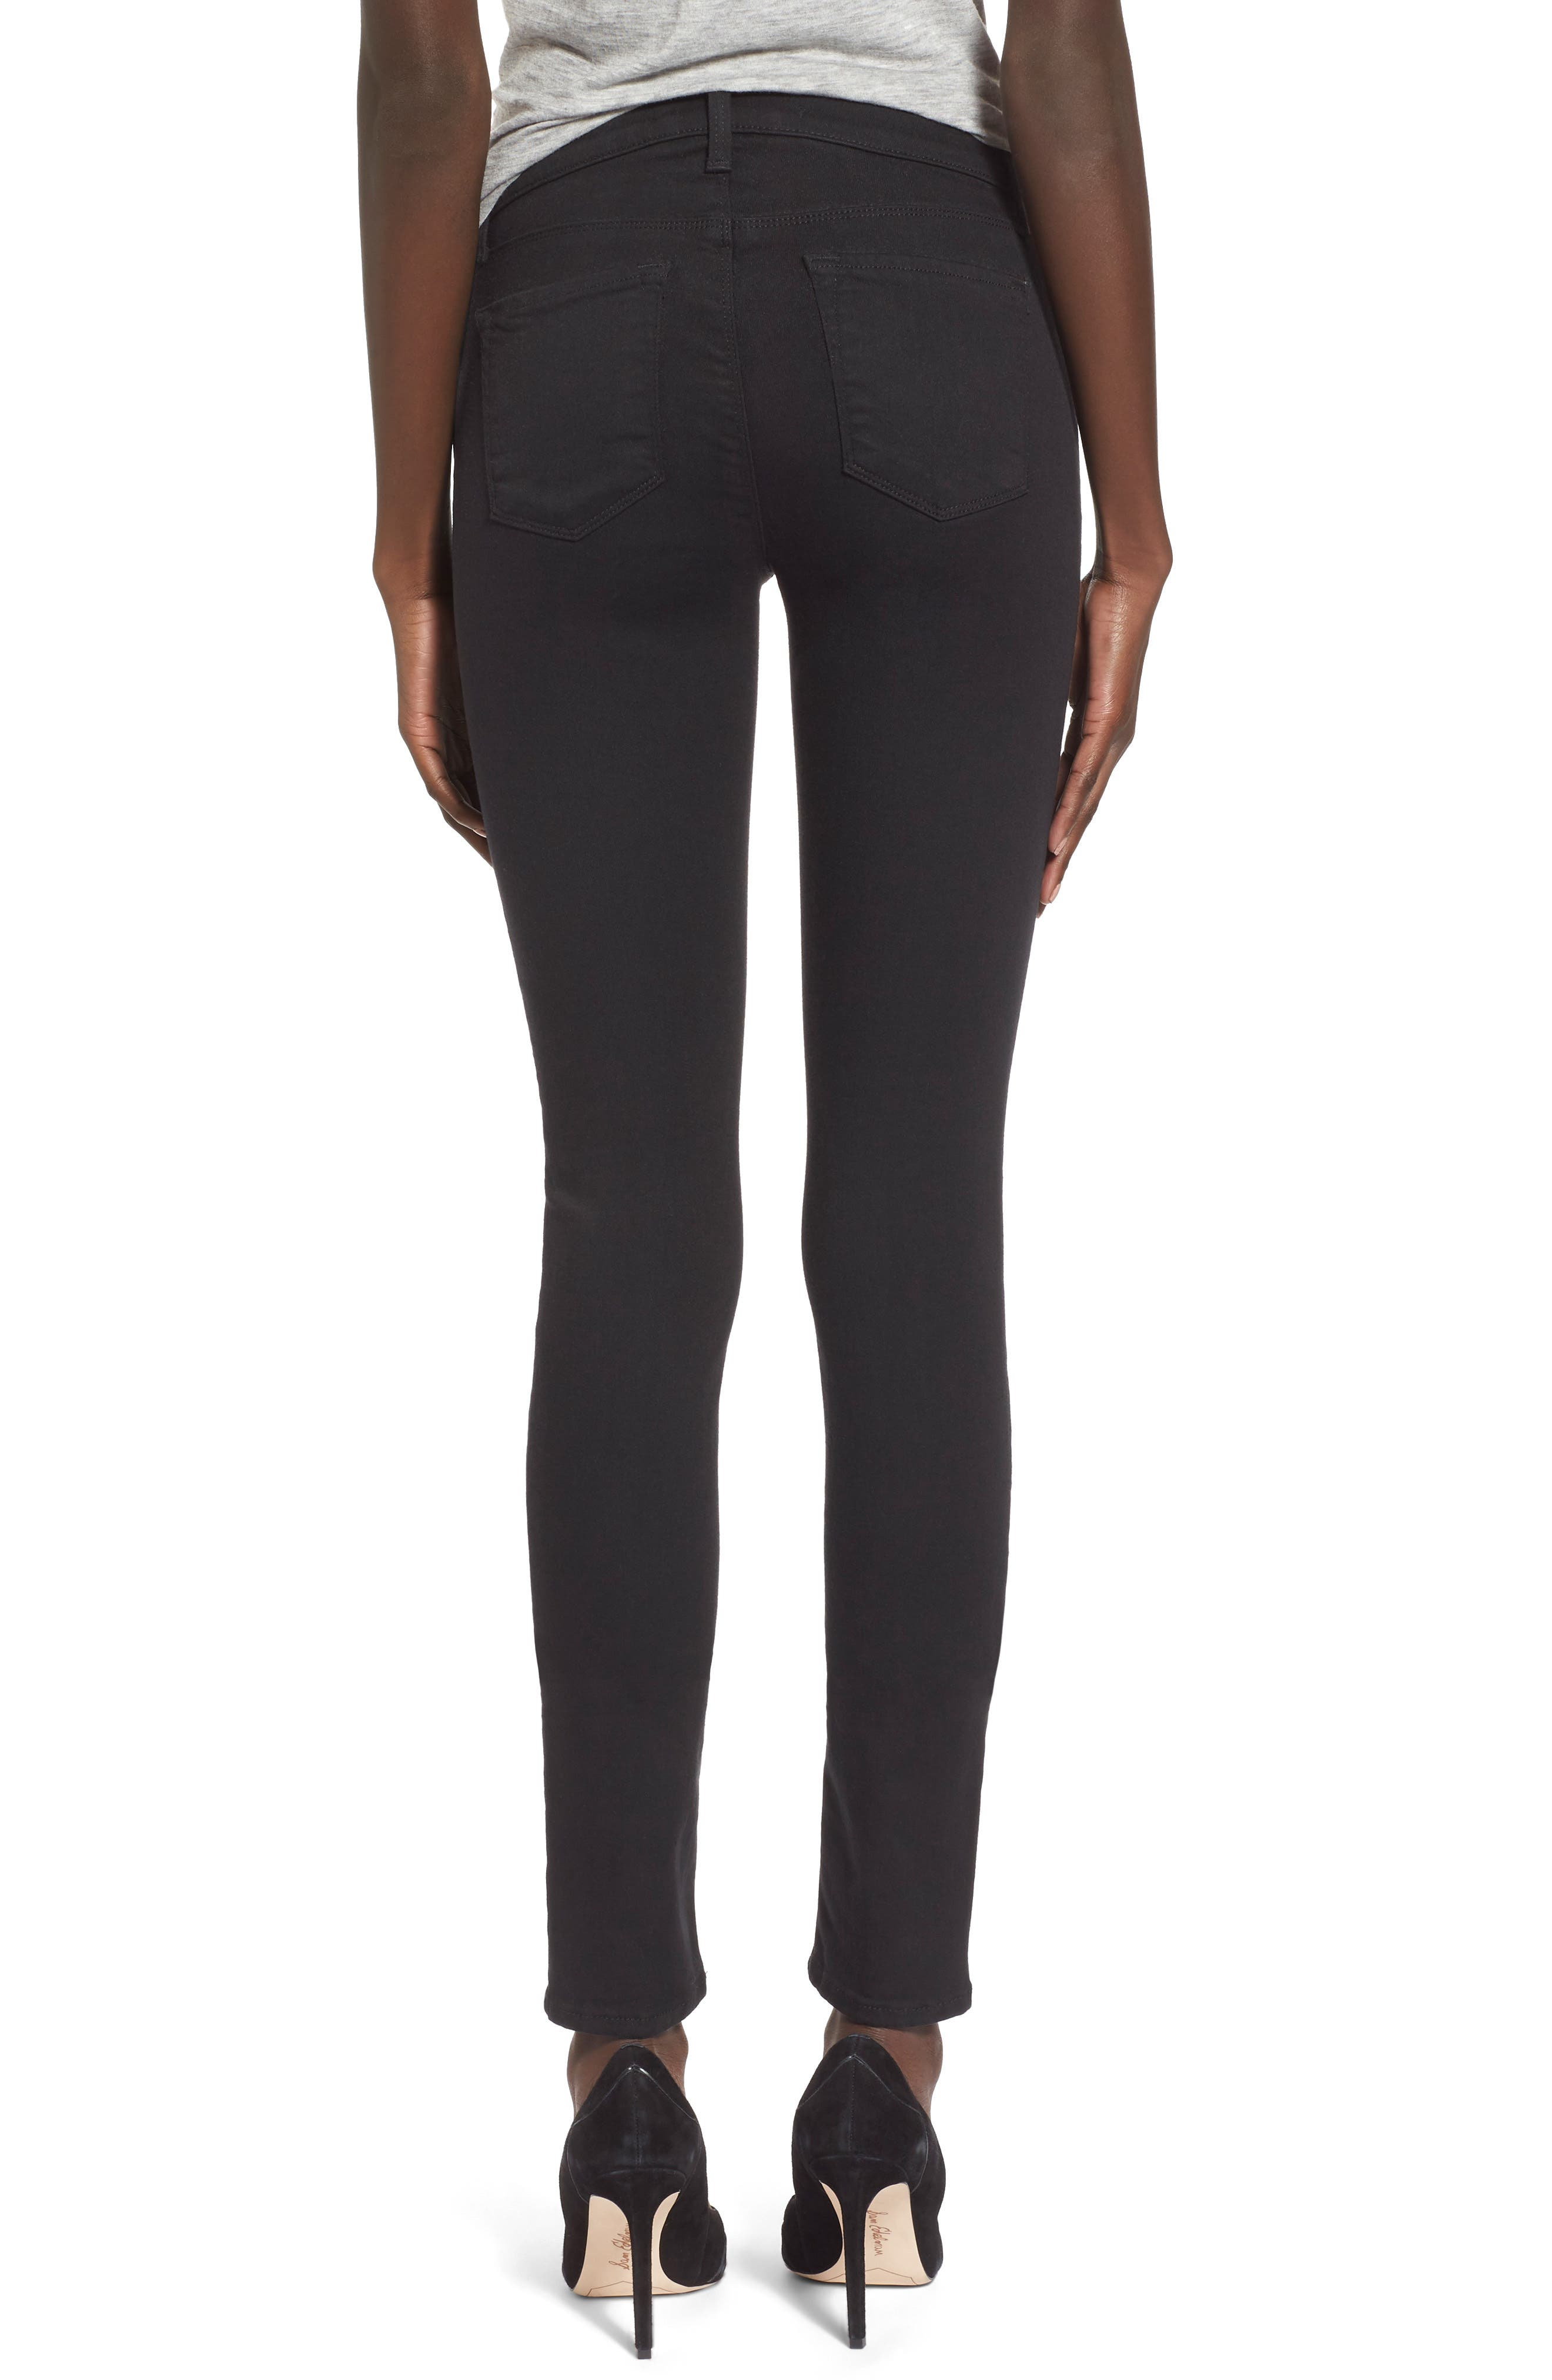 J BRAND,                             Super Skinny Jeans,                             Alternate thumbnail 6, color,                             SERIOUSLY BLACK